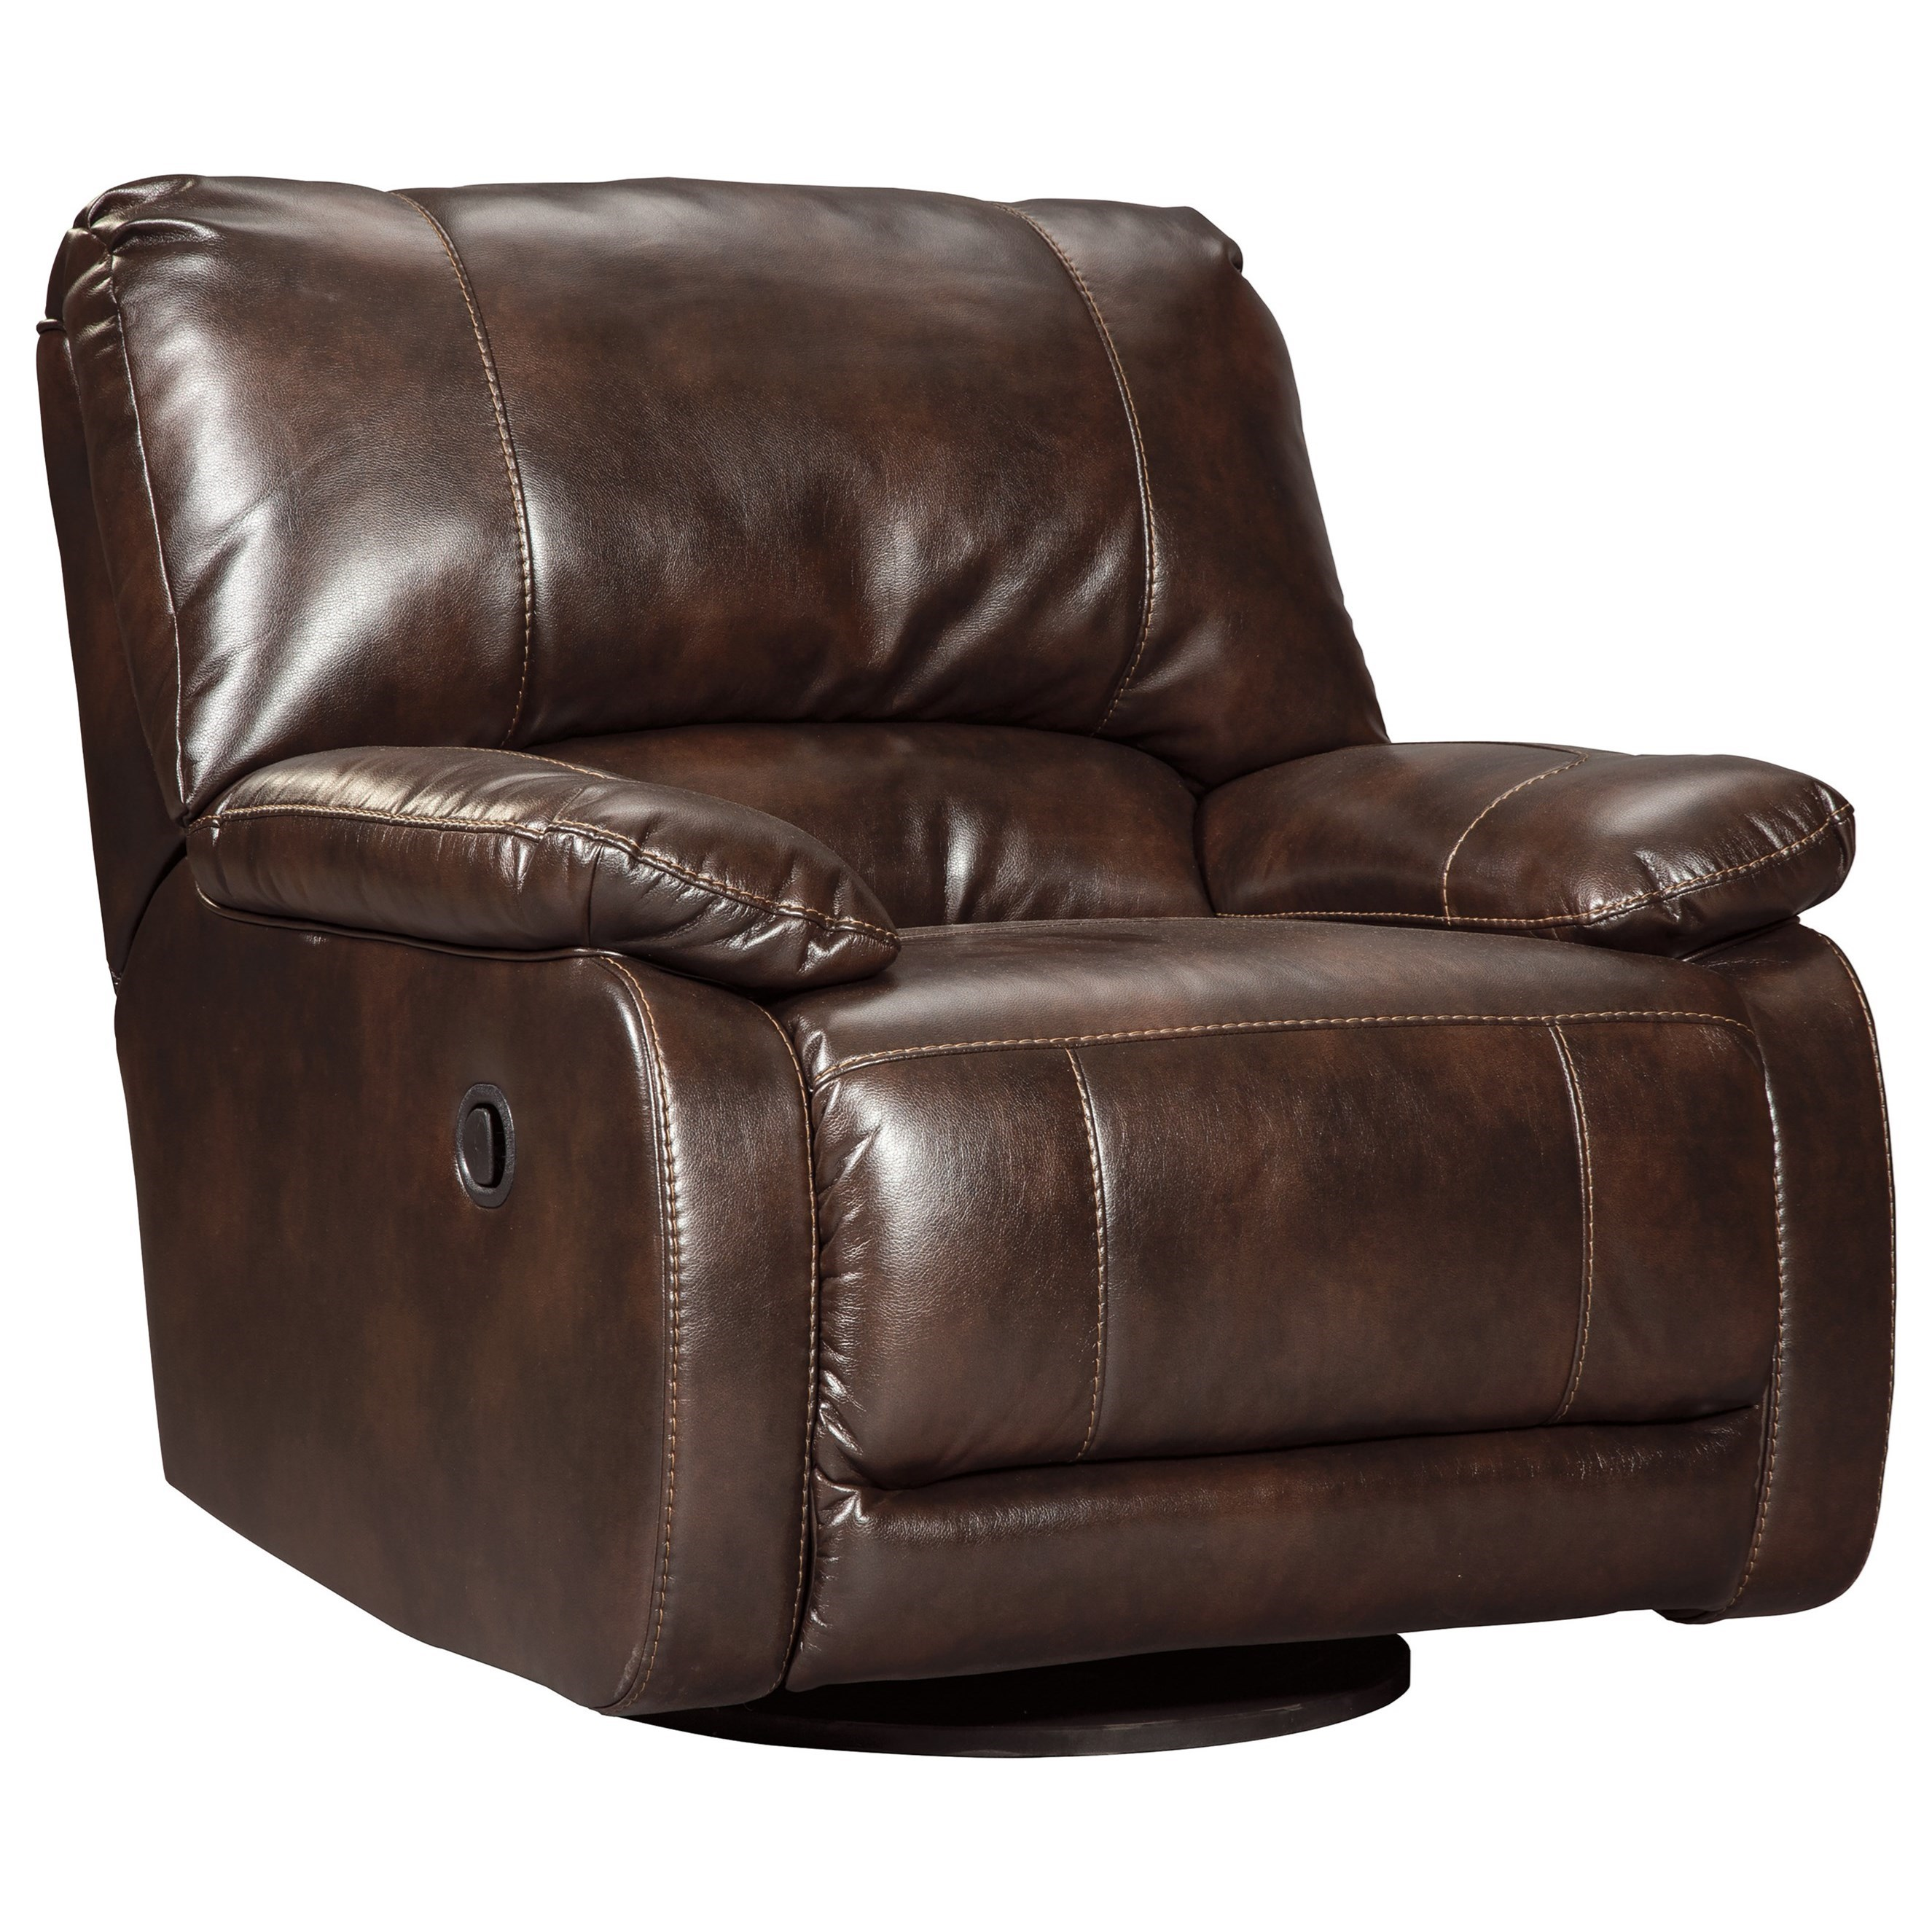 swivel chair nebraska furniture mart hanging geelong ashley signature design hallettsville 3530061 casual